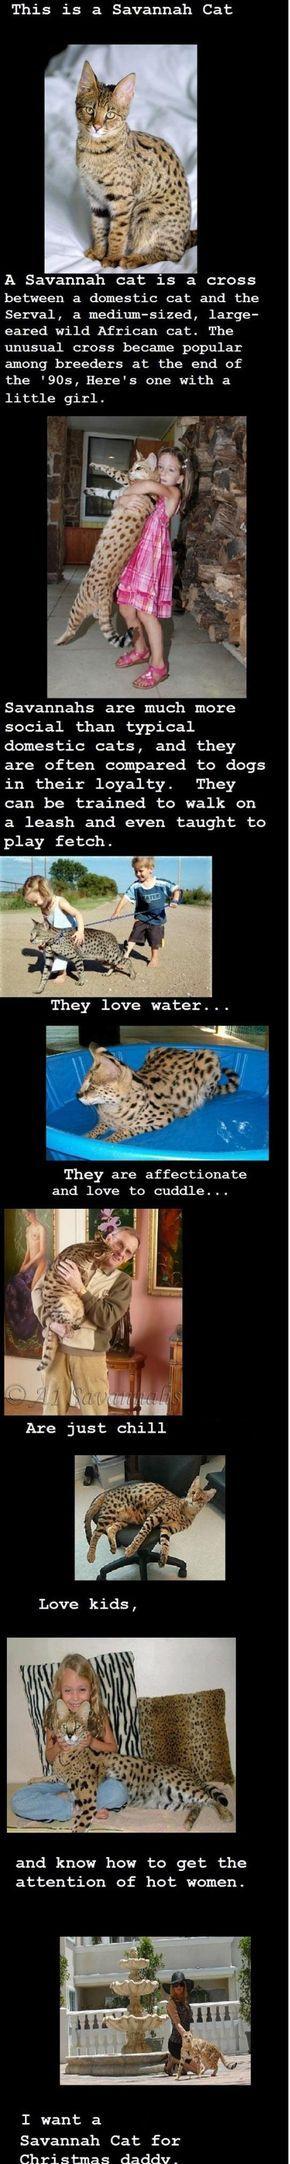 Now i want savannah cat